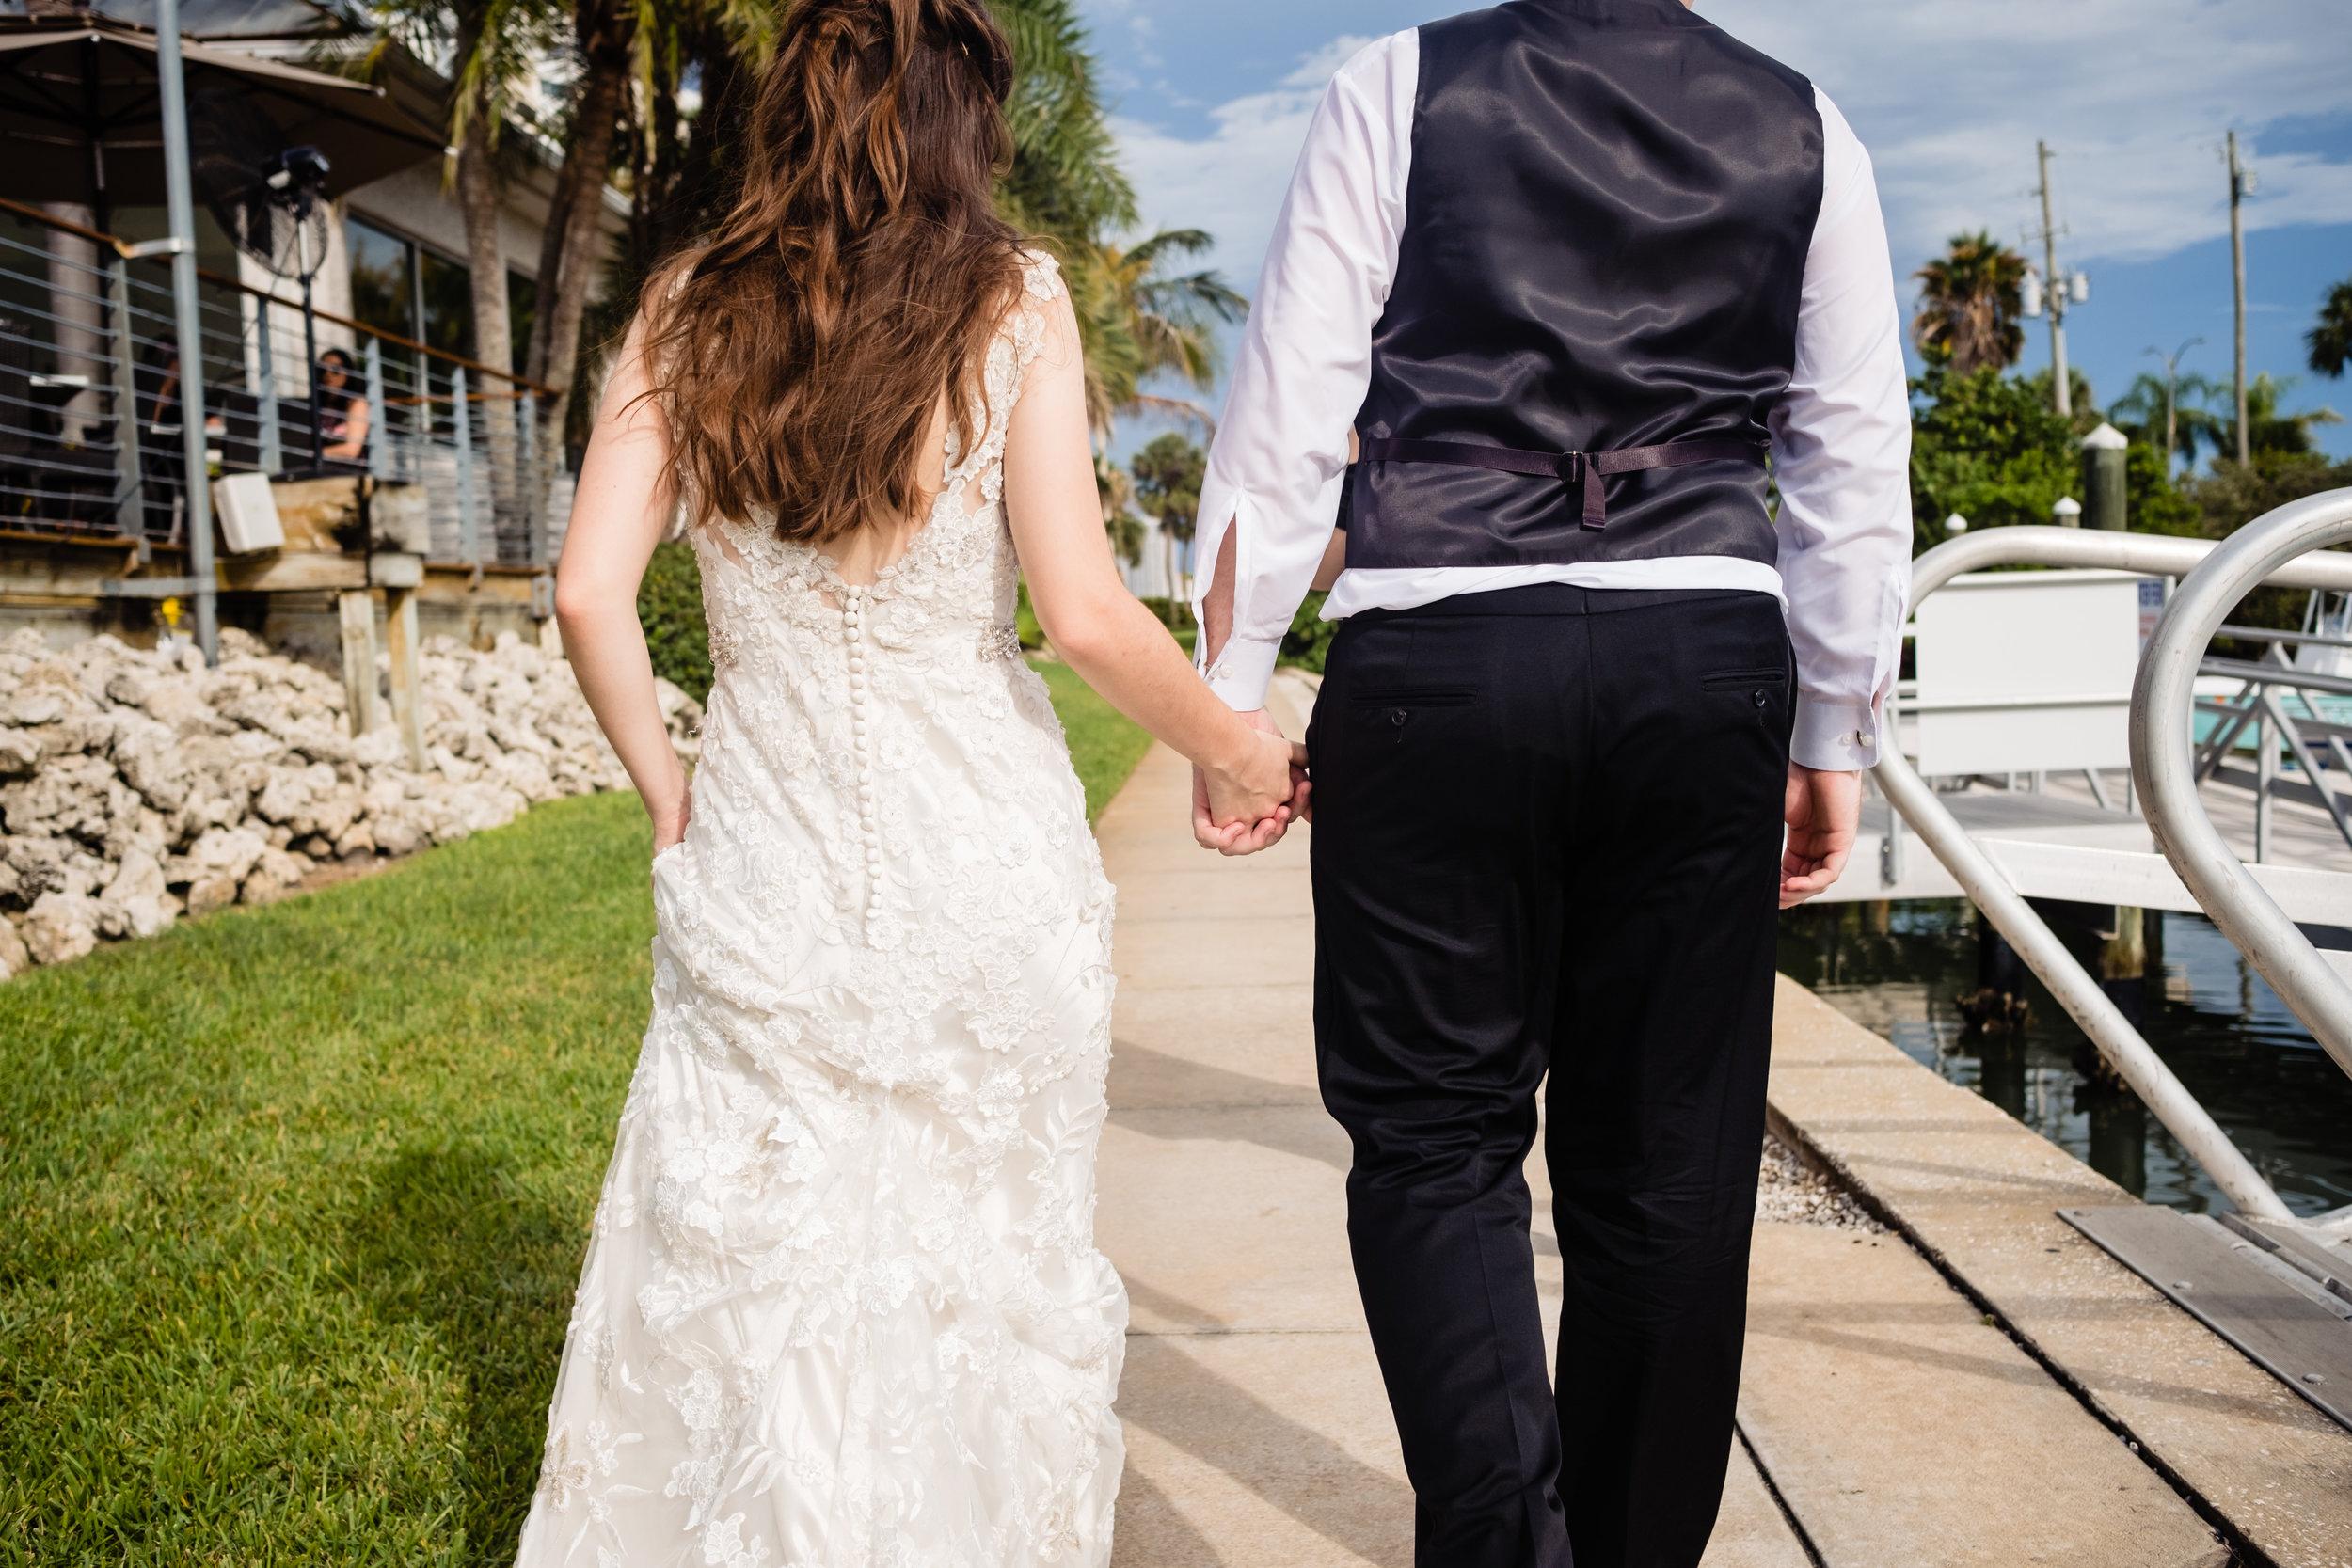 HAH_Zoe and Daniel_Clearwater Wedding_601_2018.jpg